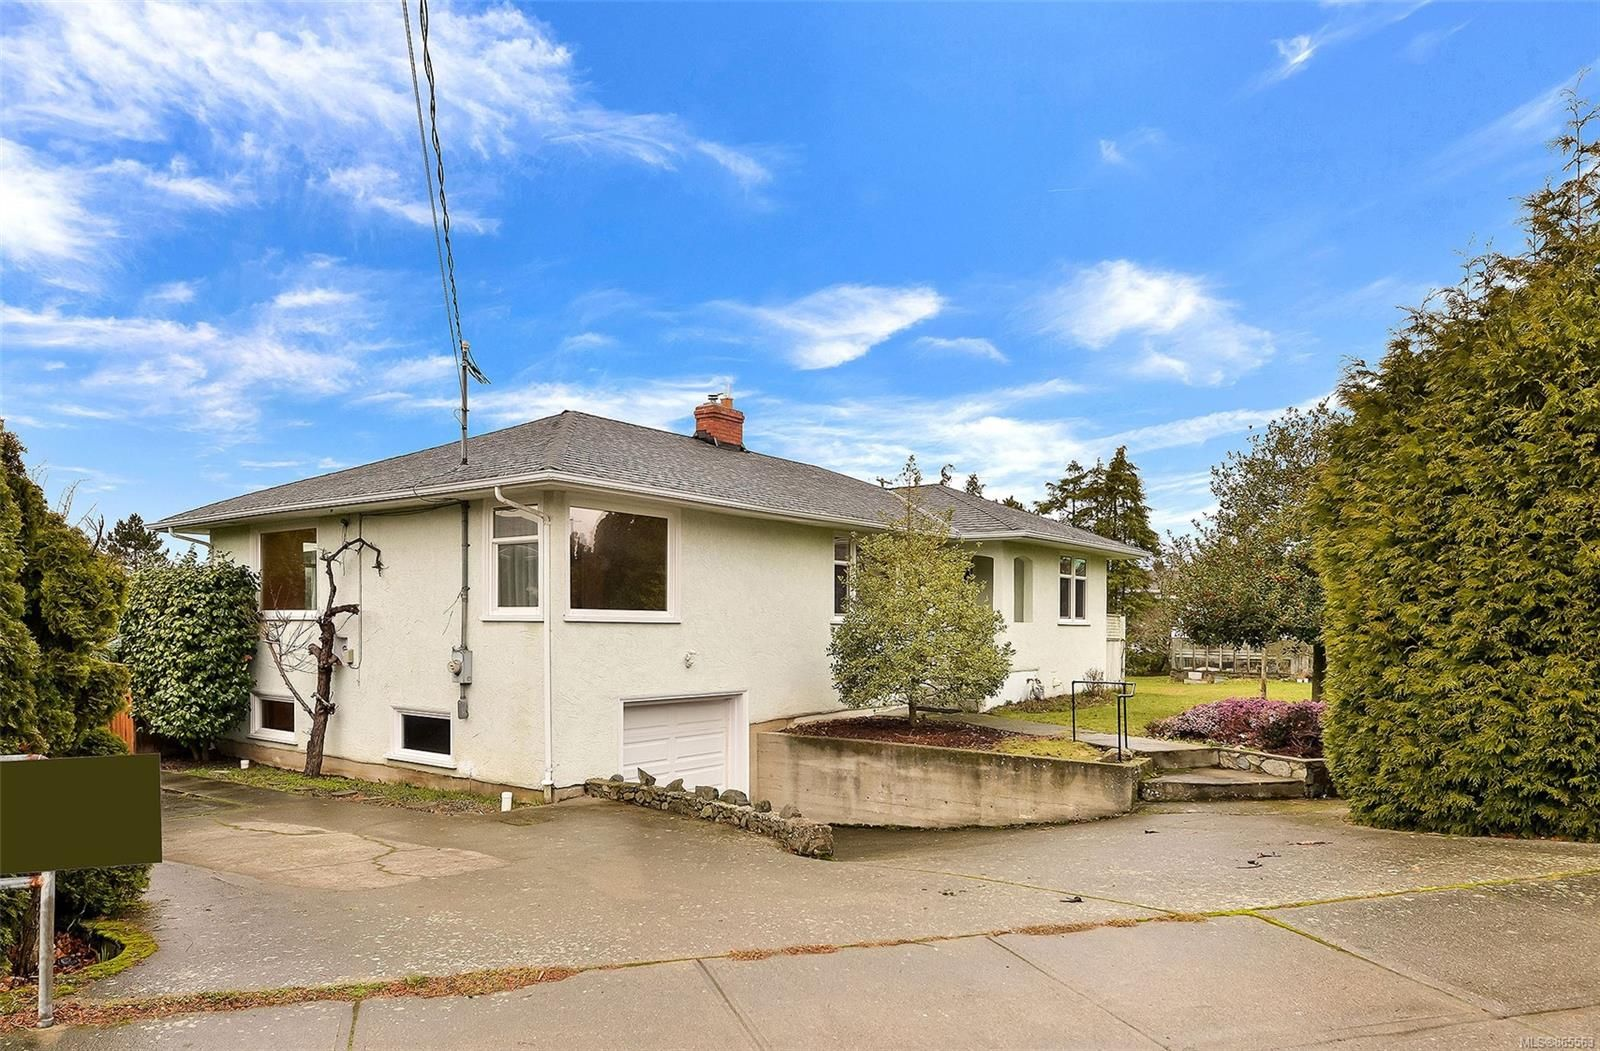 Main Photo: 3984 Gordon Head Rd in : SE Gordon Head House for sale (Saanich East)  : MLS®# 865563